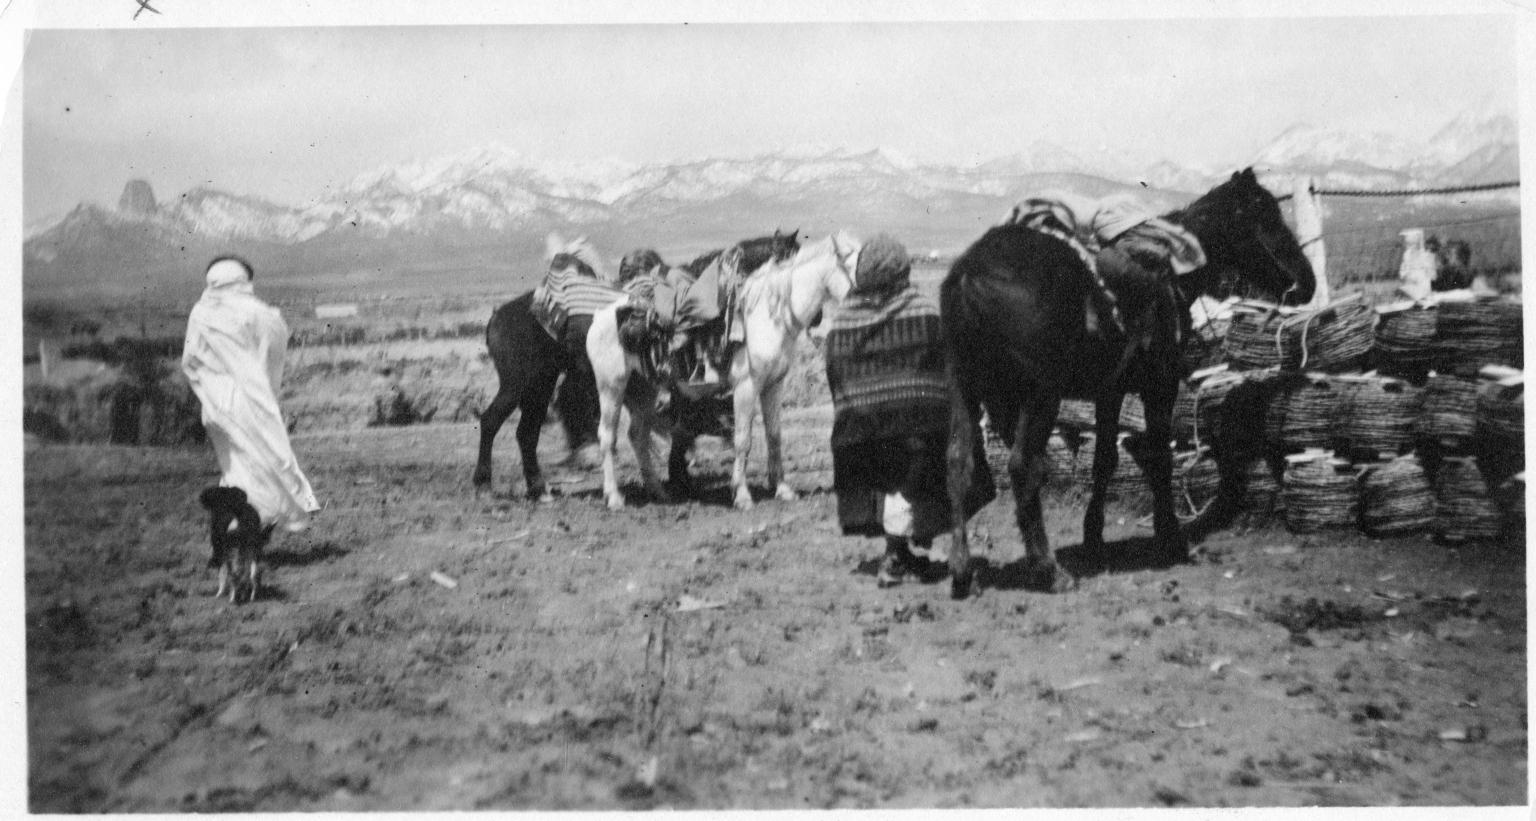 Portrait of Ute women with horses